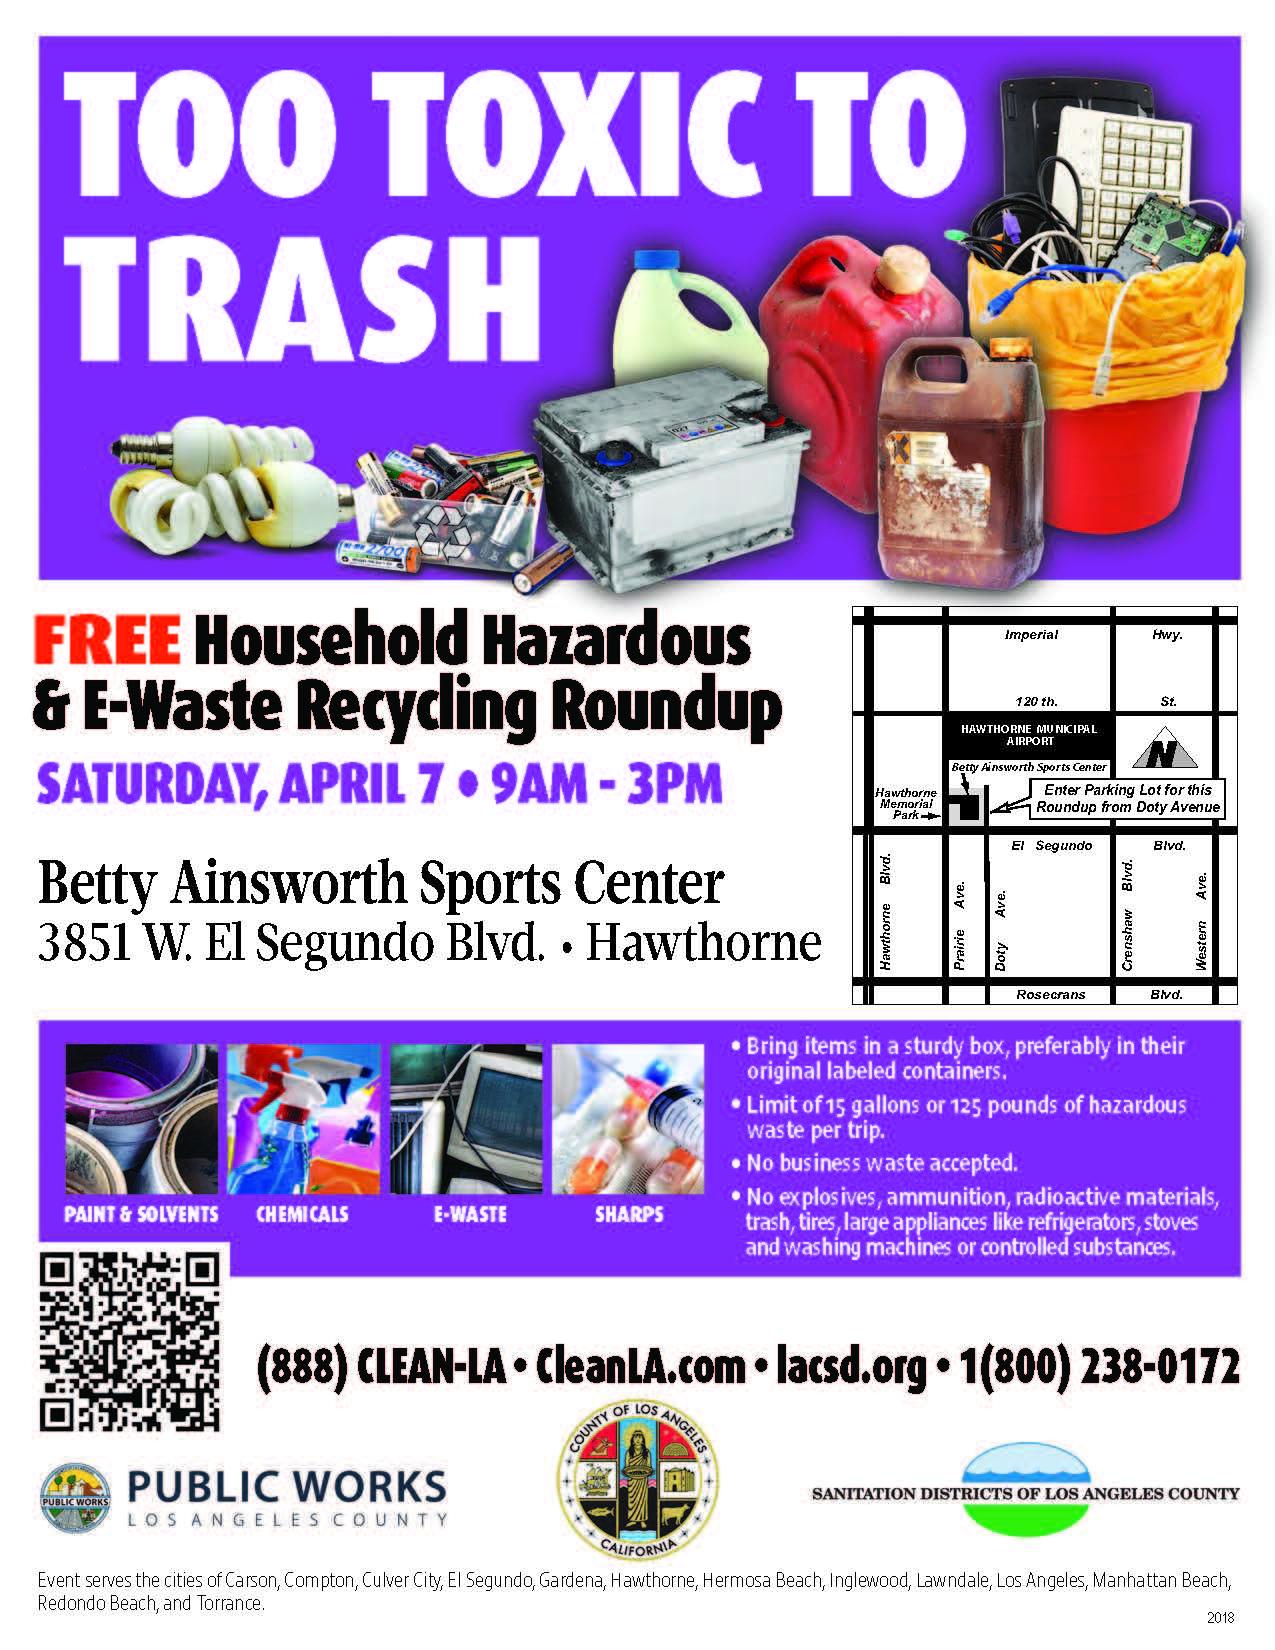 Hazardous & E-Waste Recycling Roundup